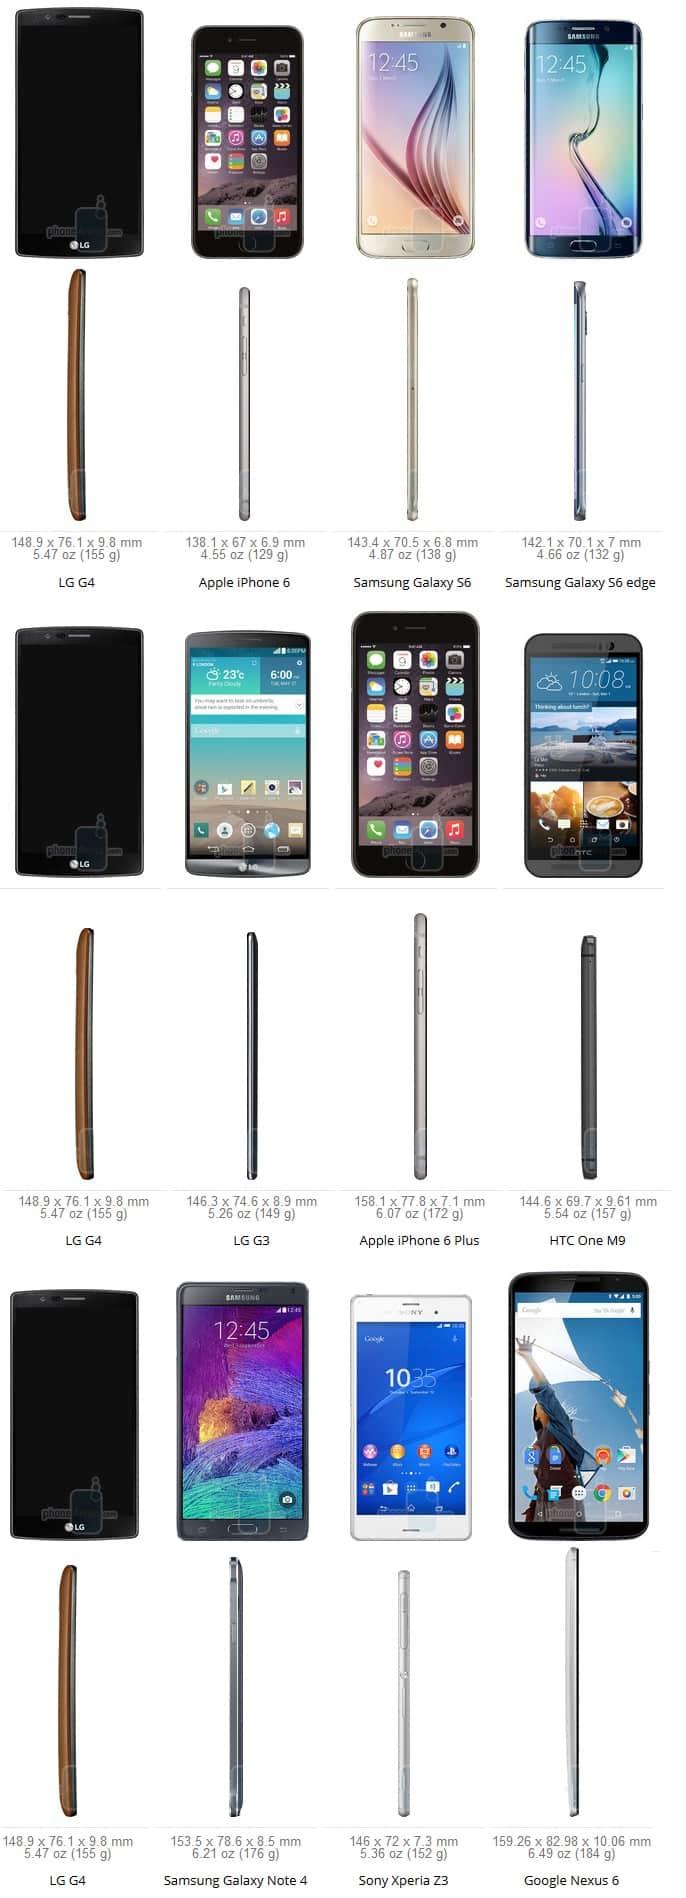 LG G4 Comparsion